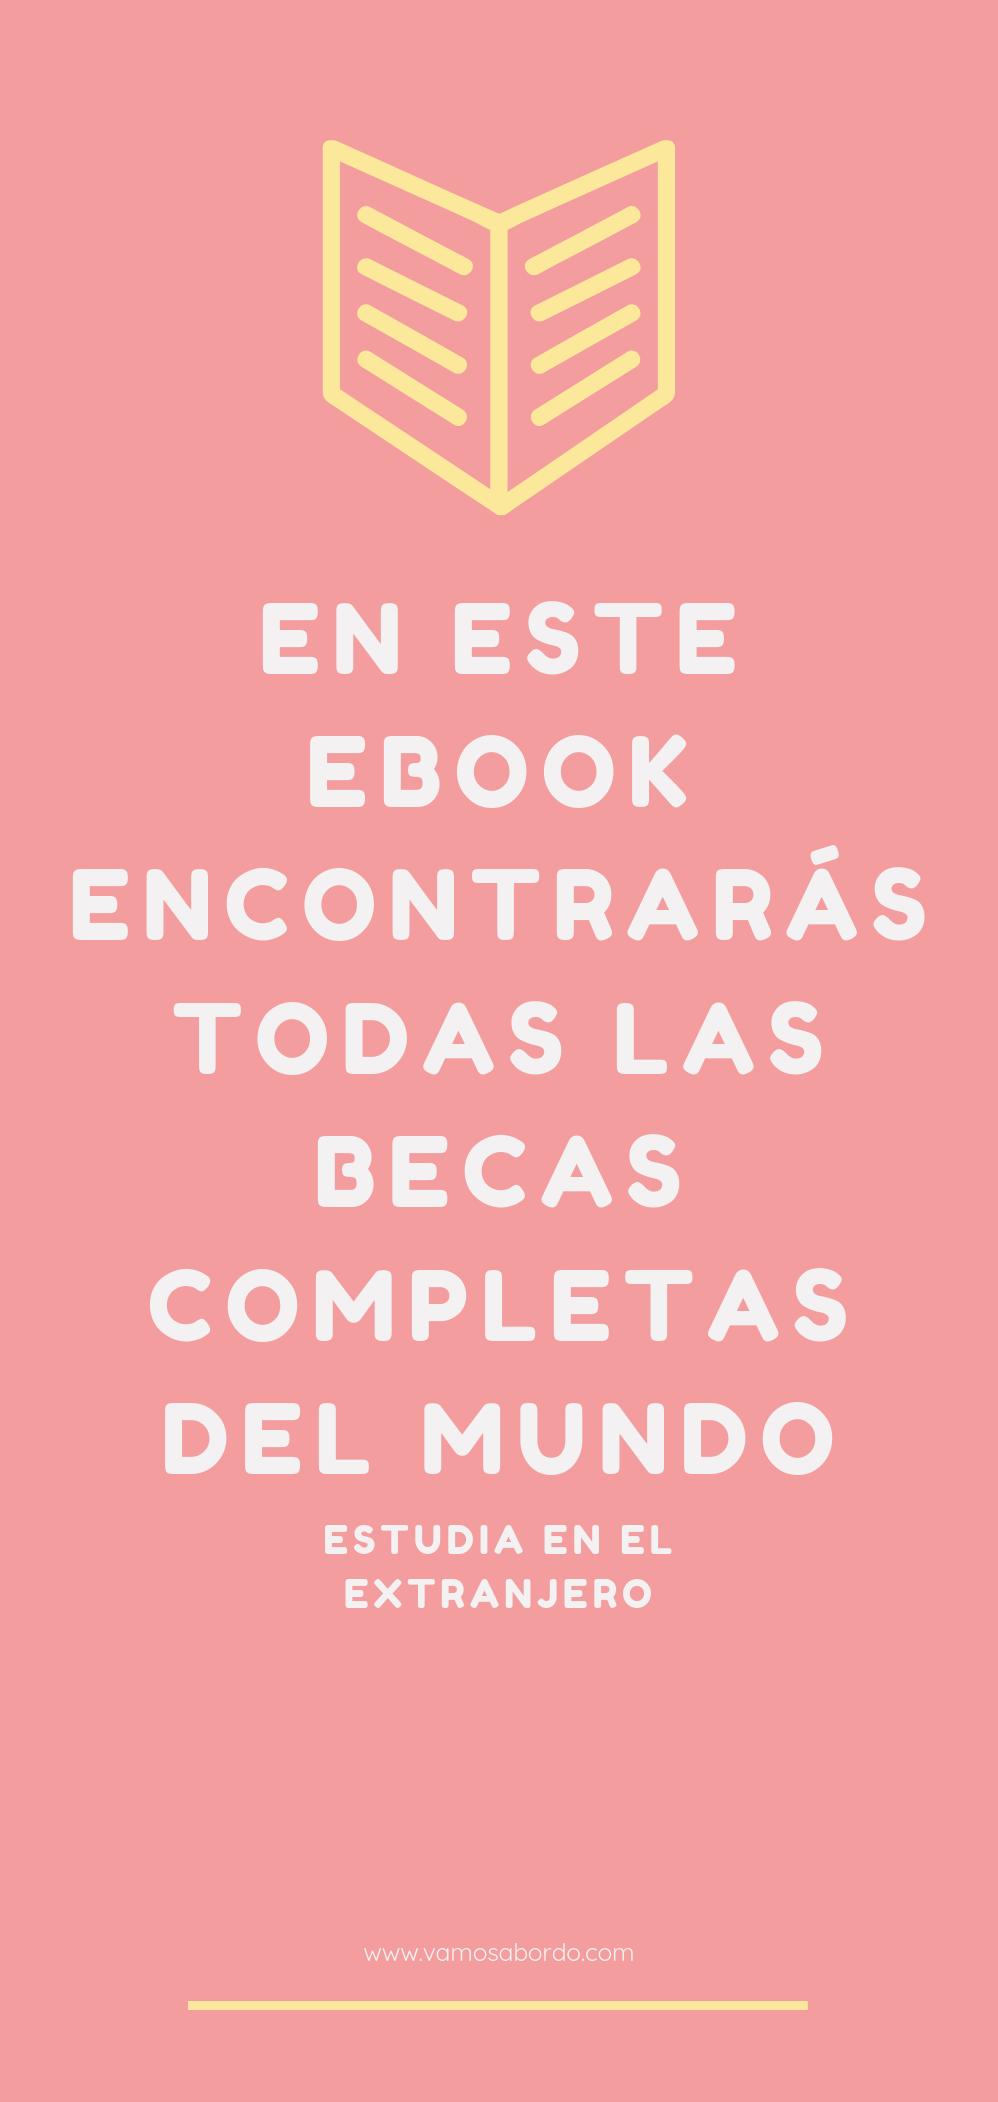 Becas Para Latinoamericanos 2021 Guía Oficial Vamos A Bordo Becas Universitarias Becas Para Estudiar Ingles Cartas De Motivacion